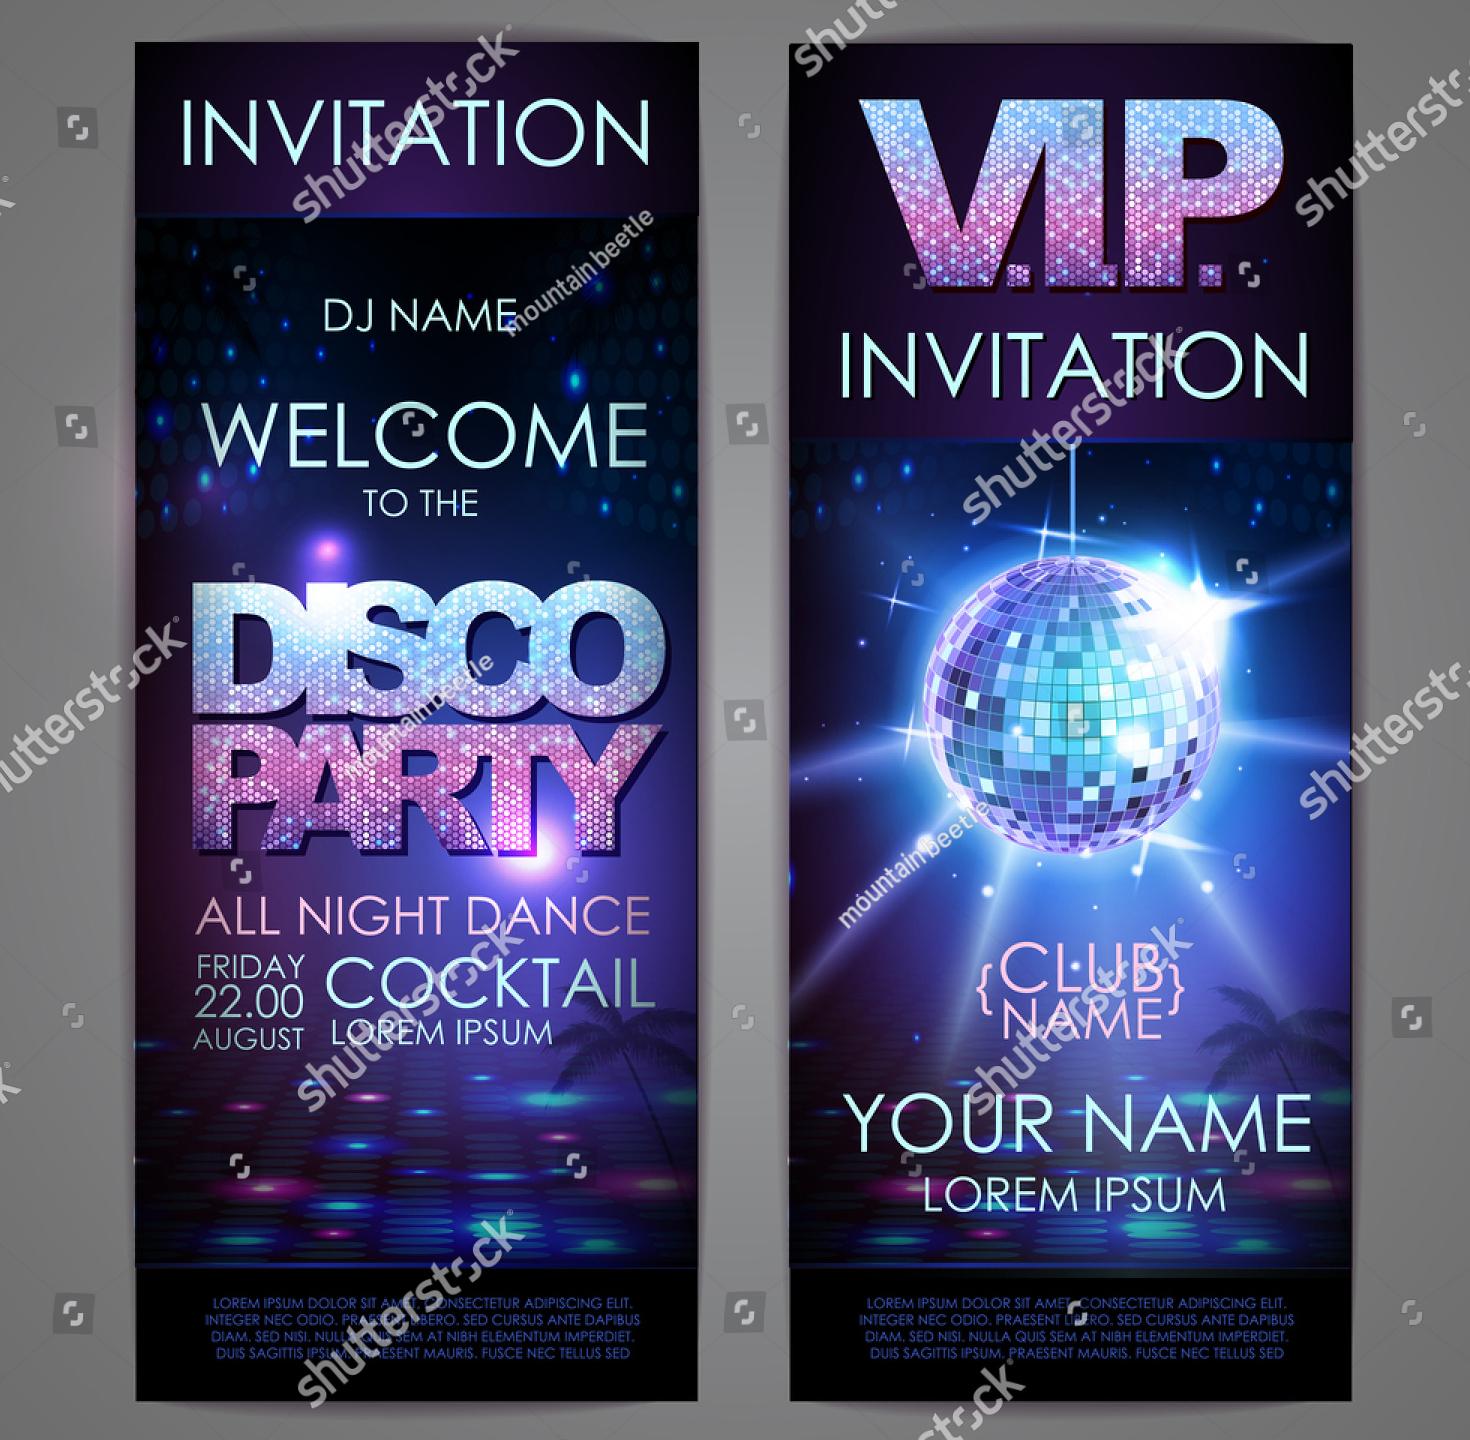 music dj party invitation